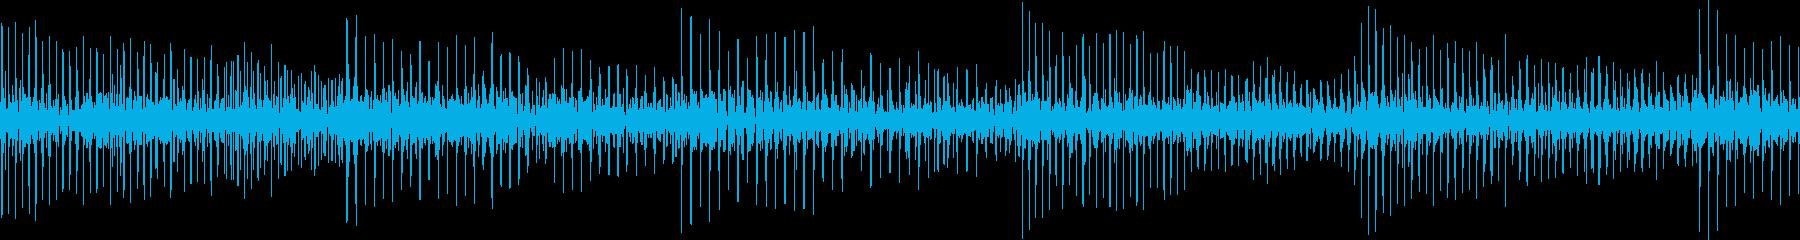 AMGアナログFX 12の再生済みの波形